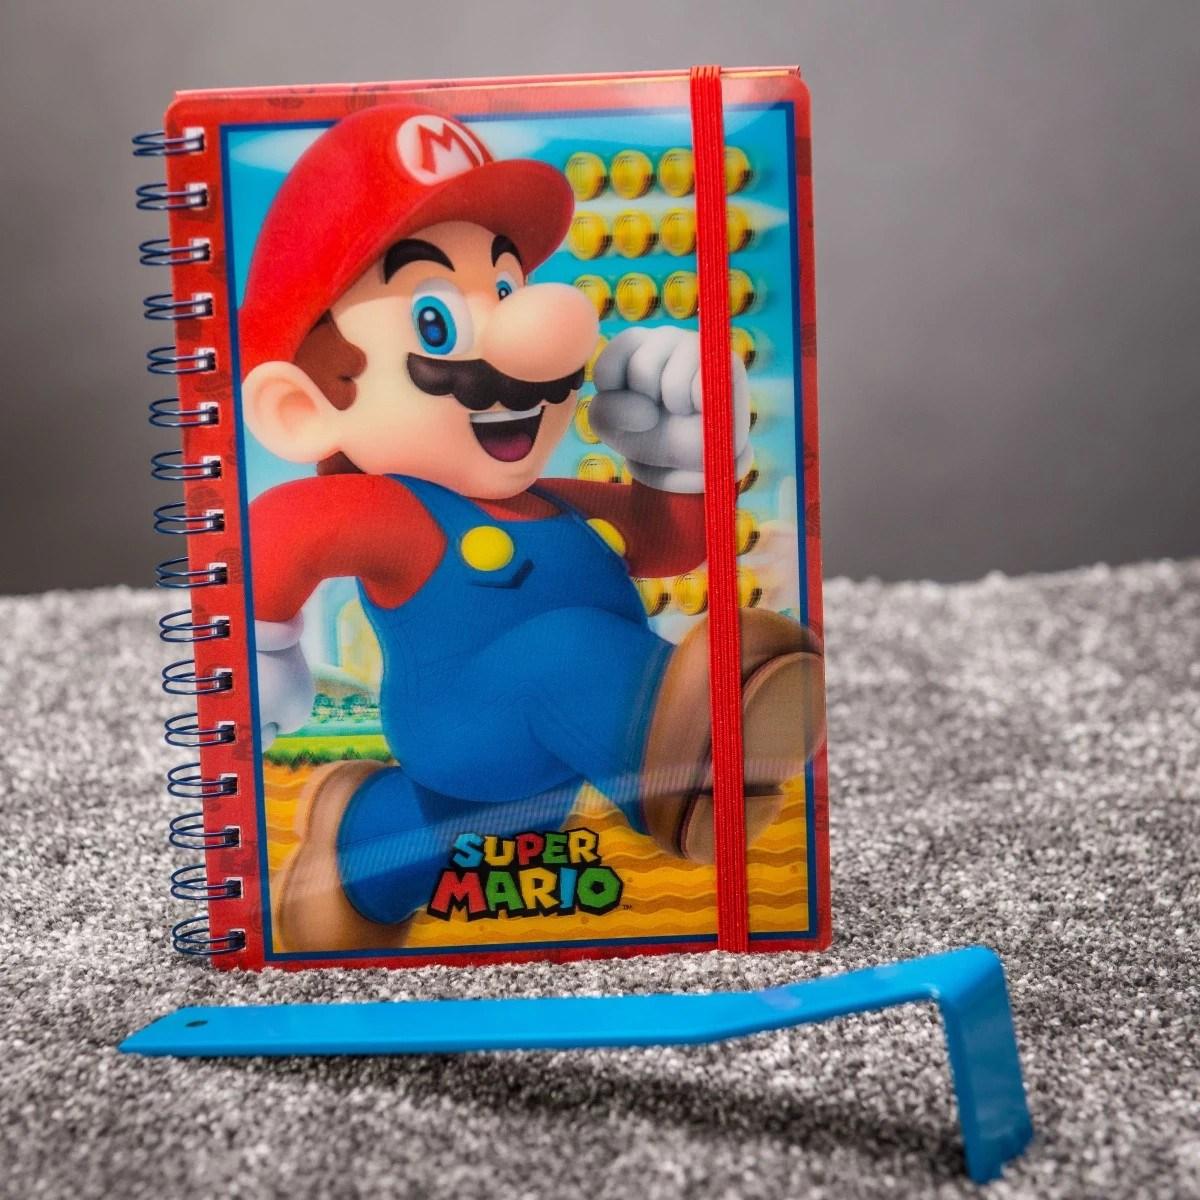 Bedna pro fanouška hry Super Mario